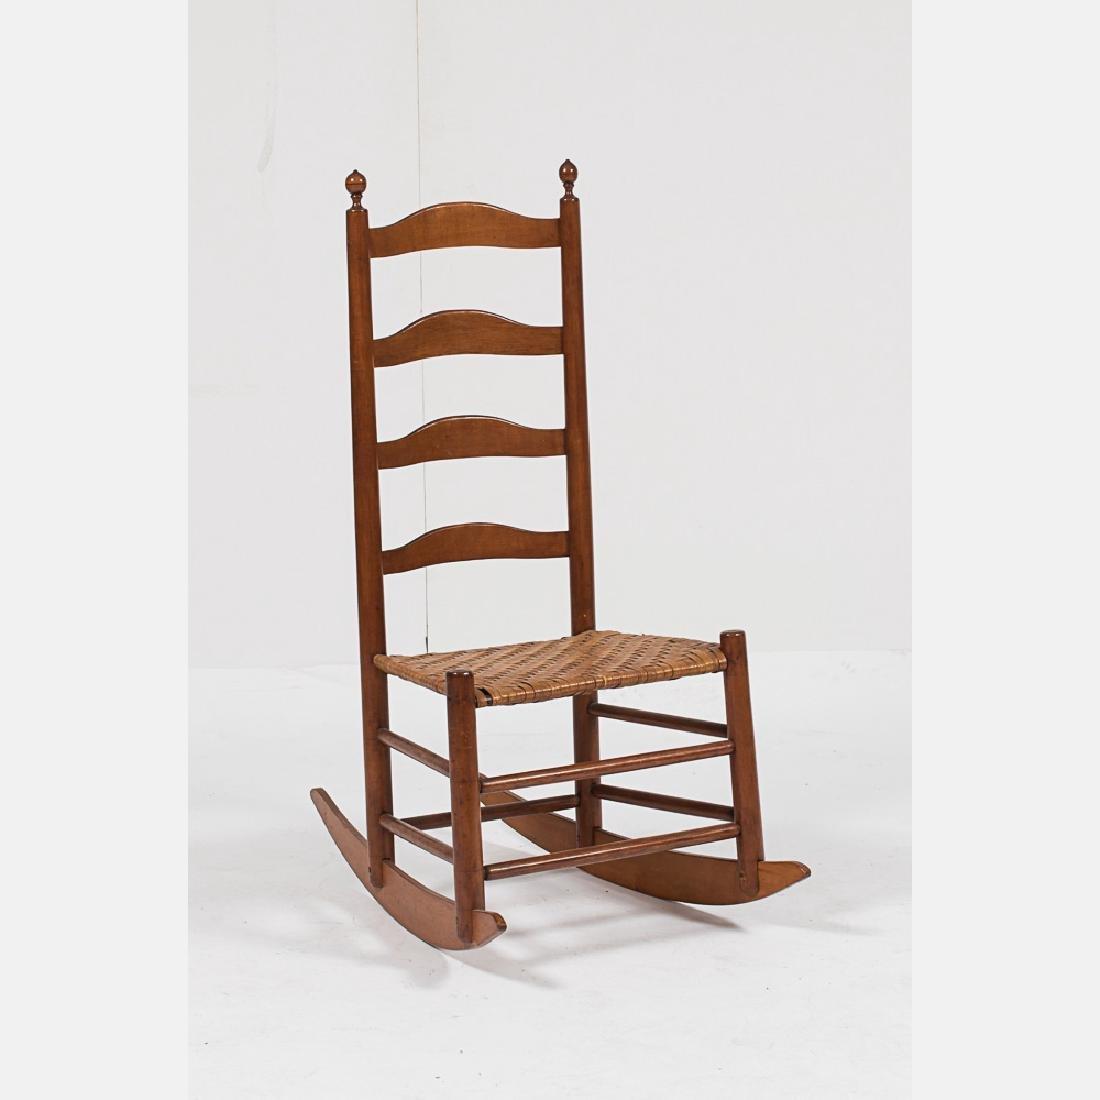 American Shaker Cherry Ladder Back Rocking Chair